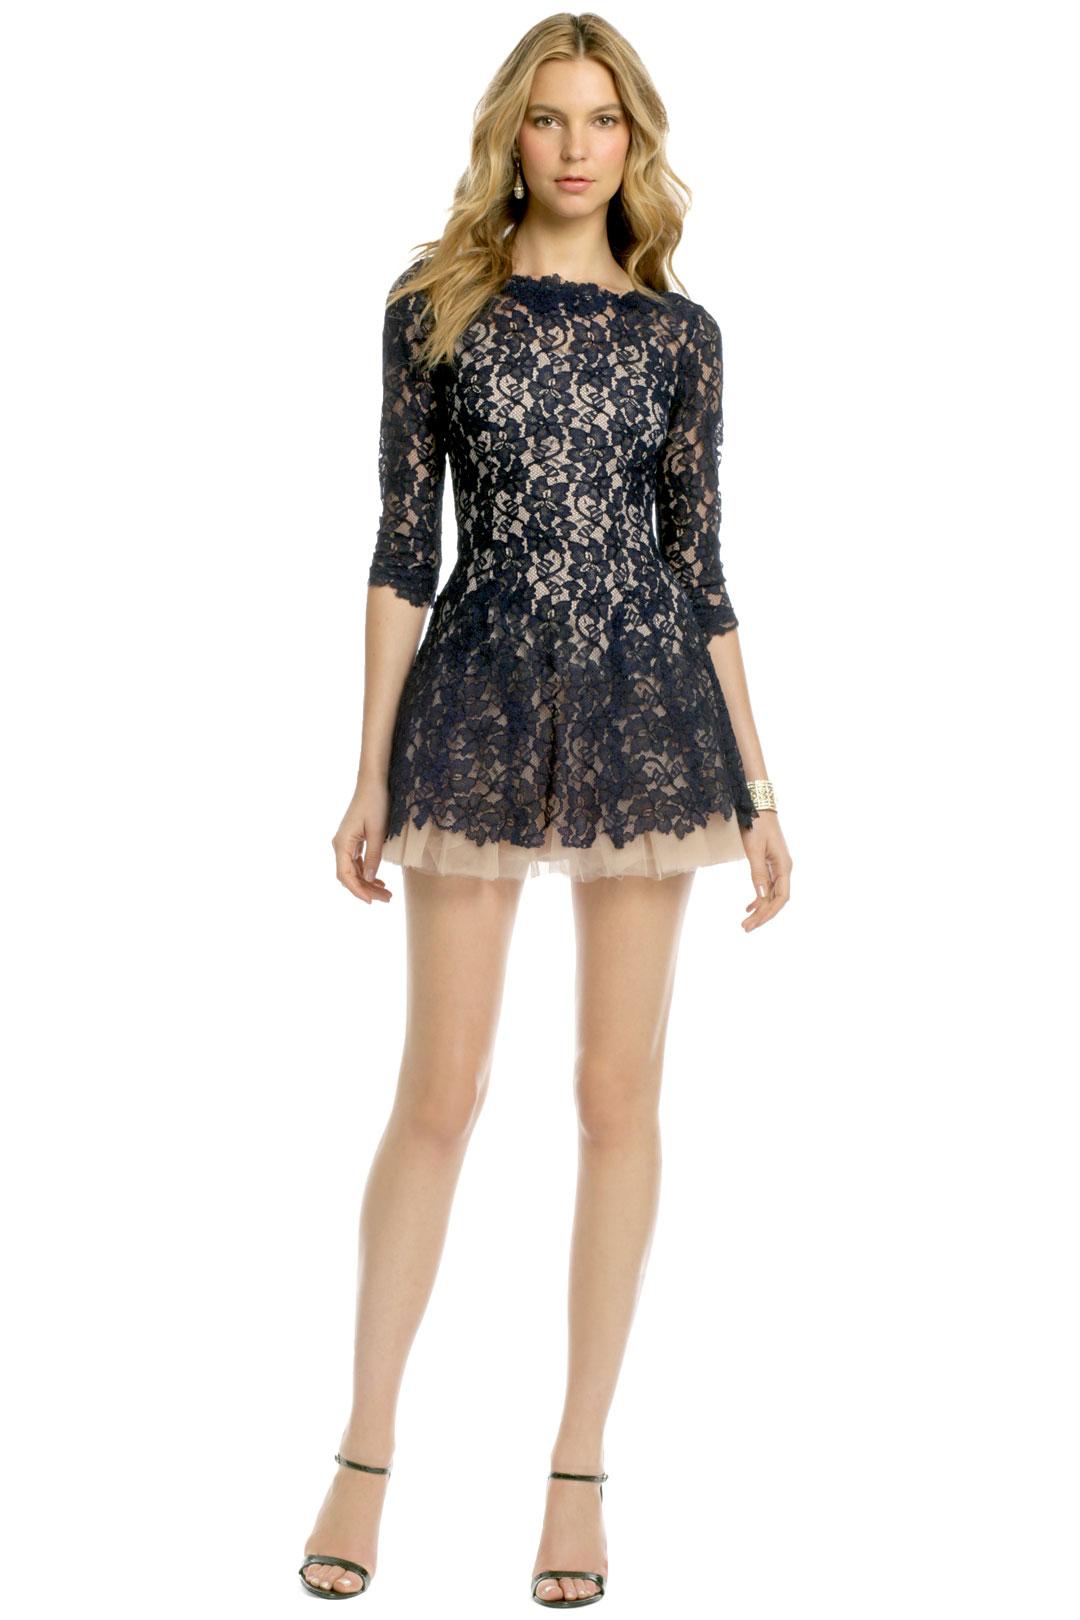 Sweet Talk Dress by nha khanh at $44.99 | Rent The Runway